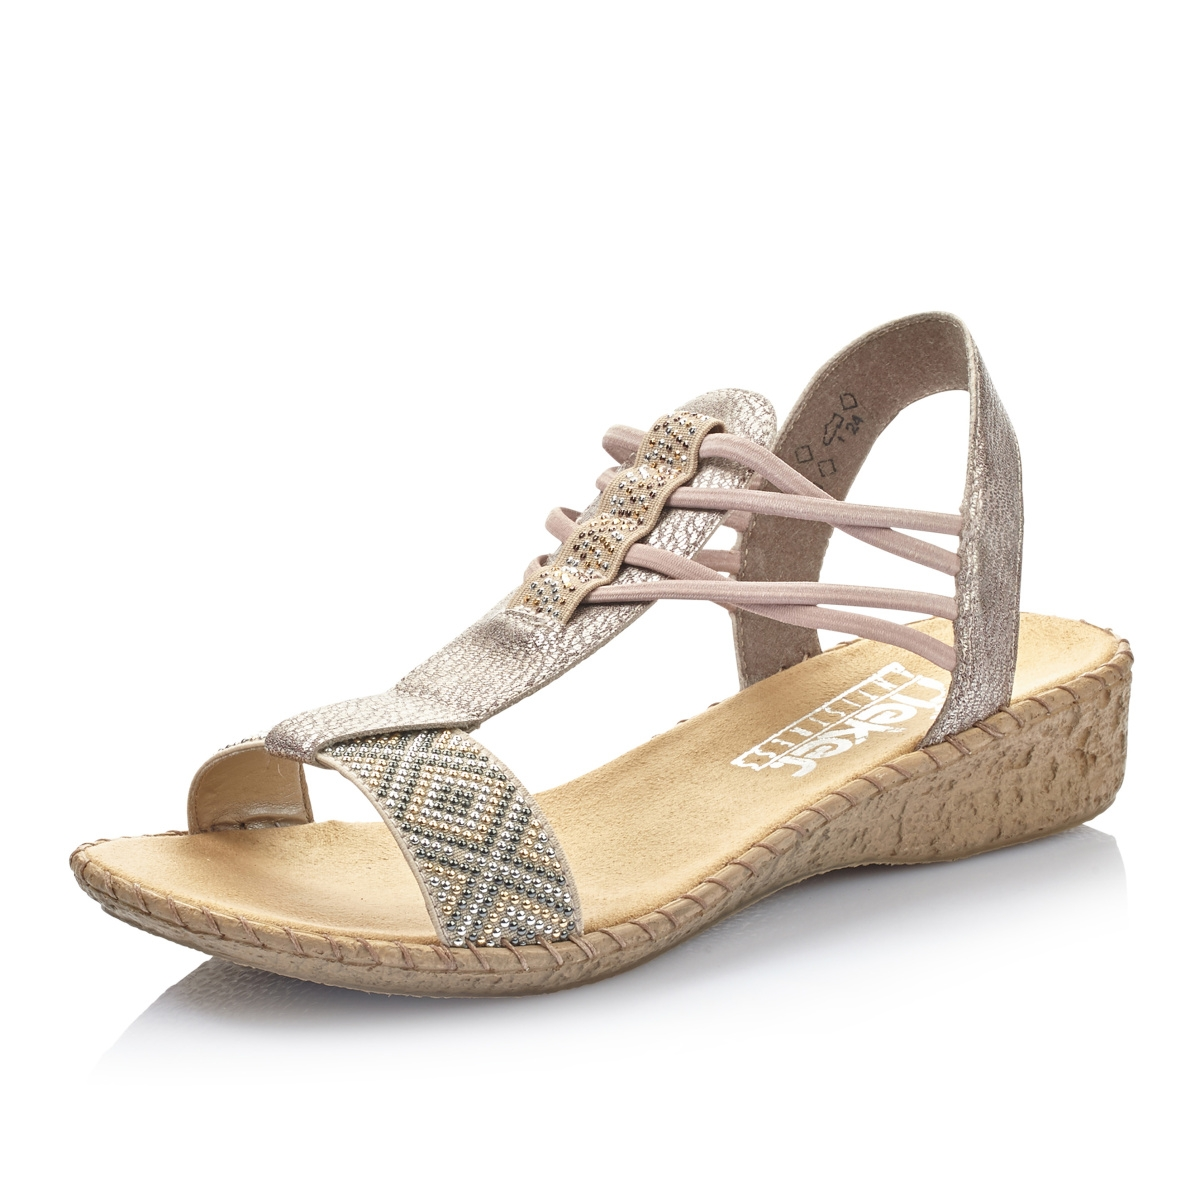 2a5482b3b9e Dámská obuv RIEKER61662-60 BEIGE KOMBI F S 9